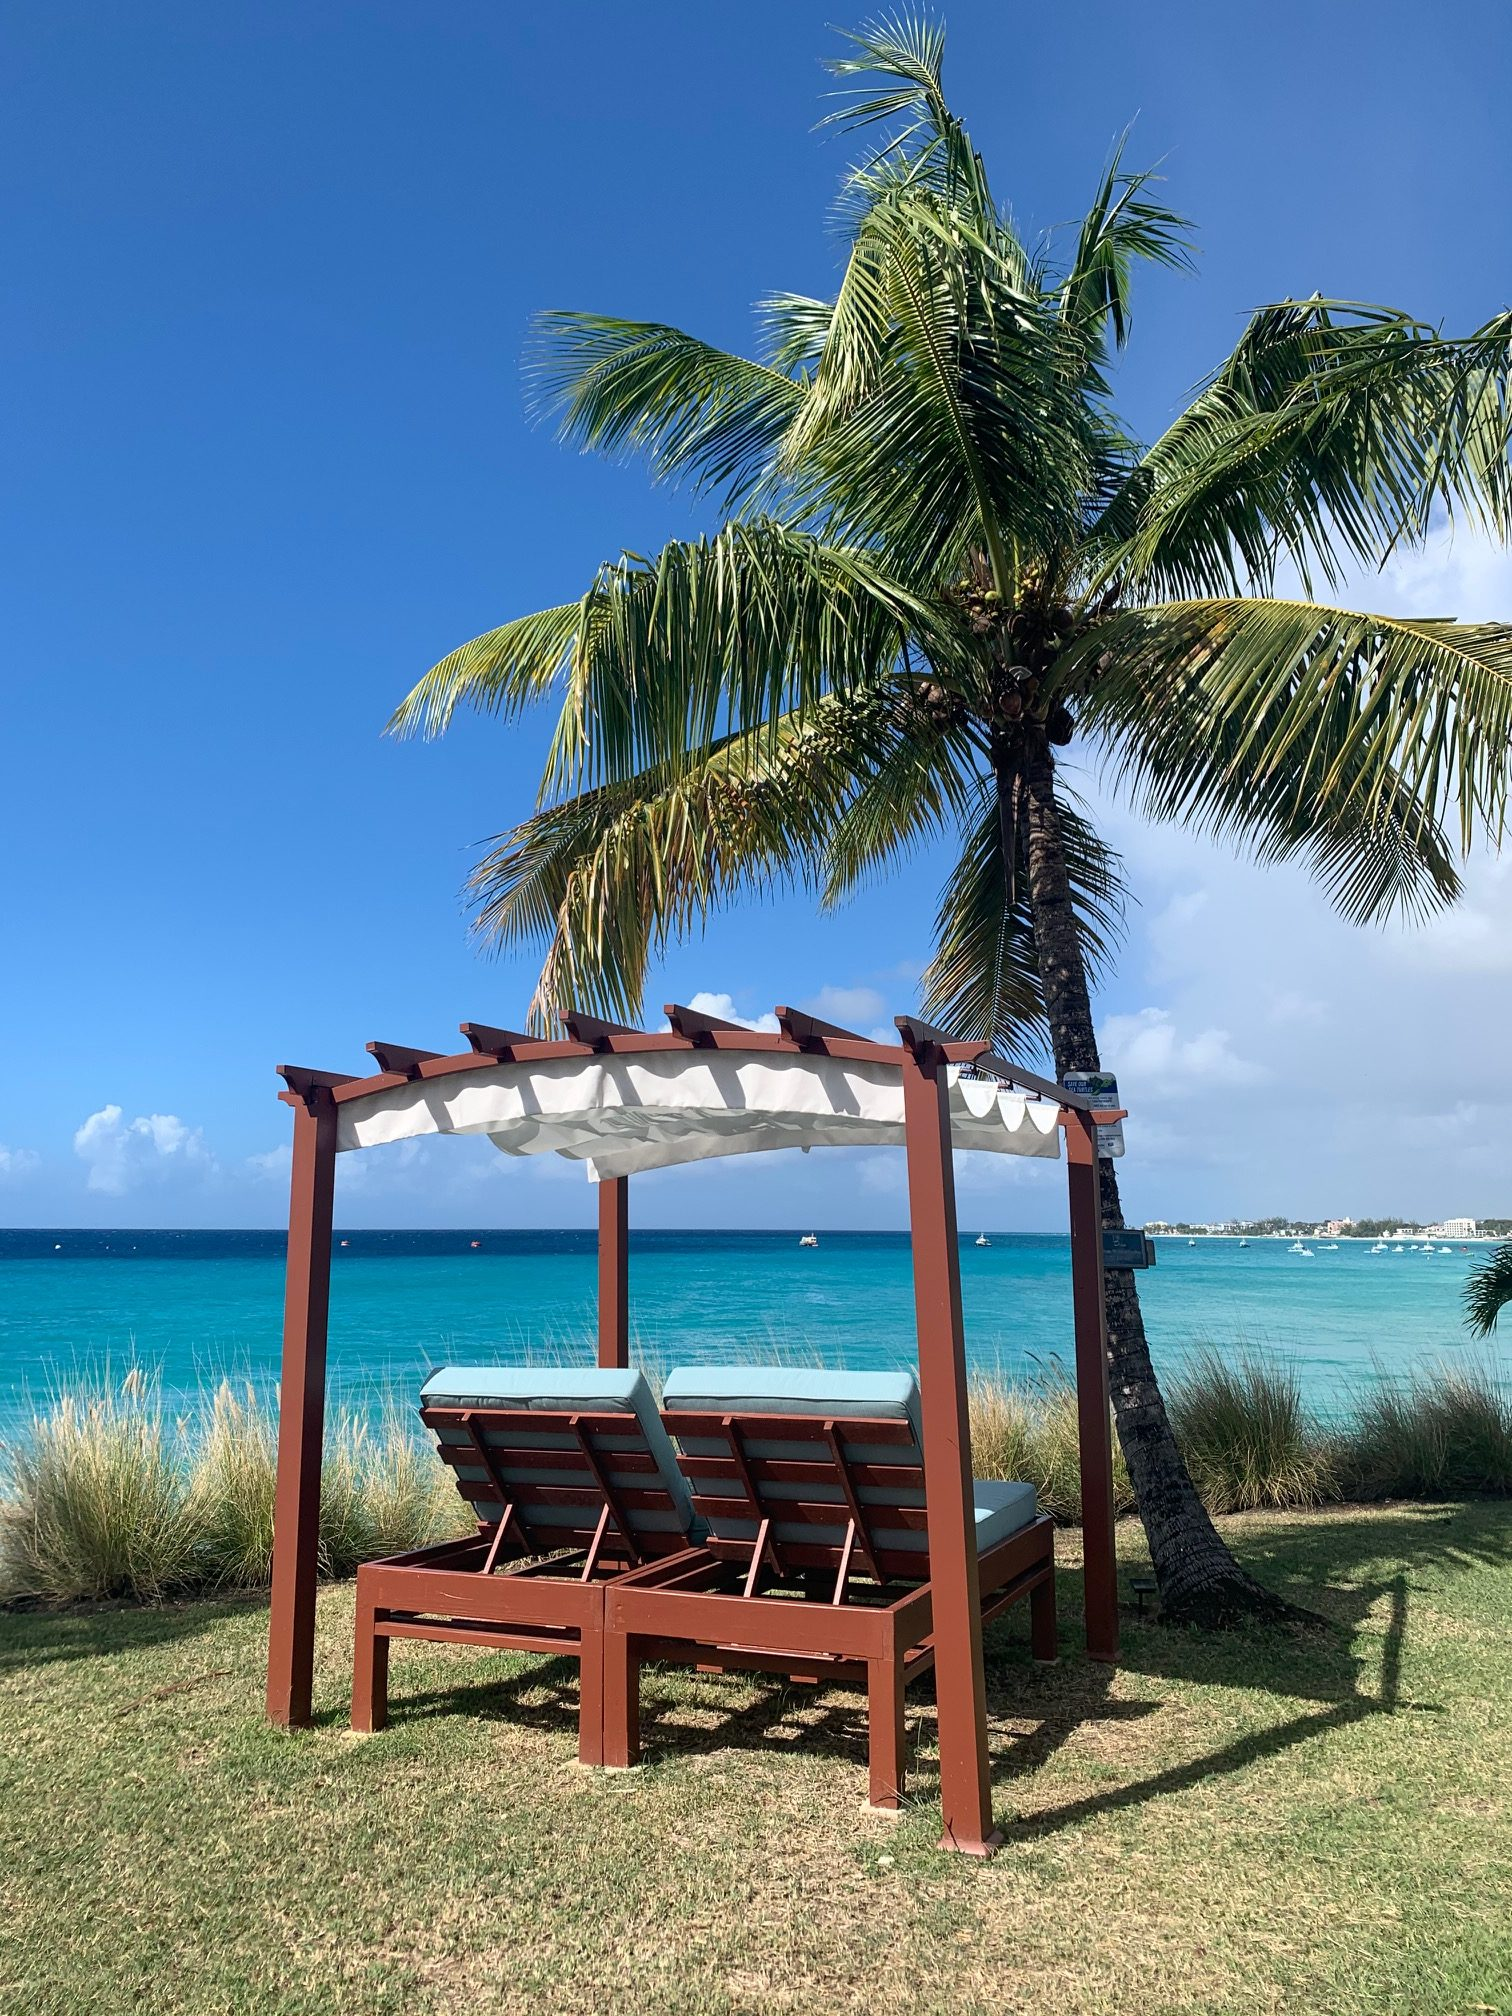 Wanted: Adventurers seeking activities in Barbados. Reward: Living the dream.